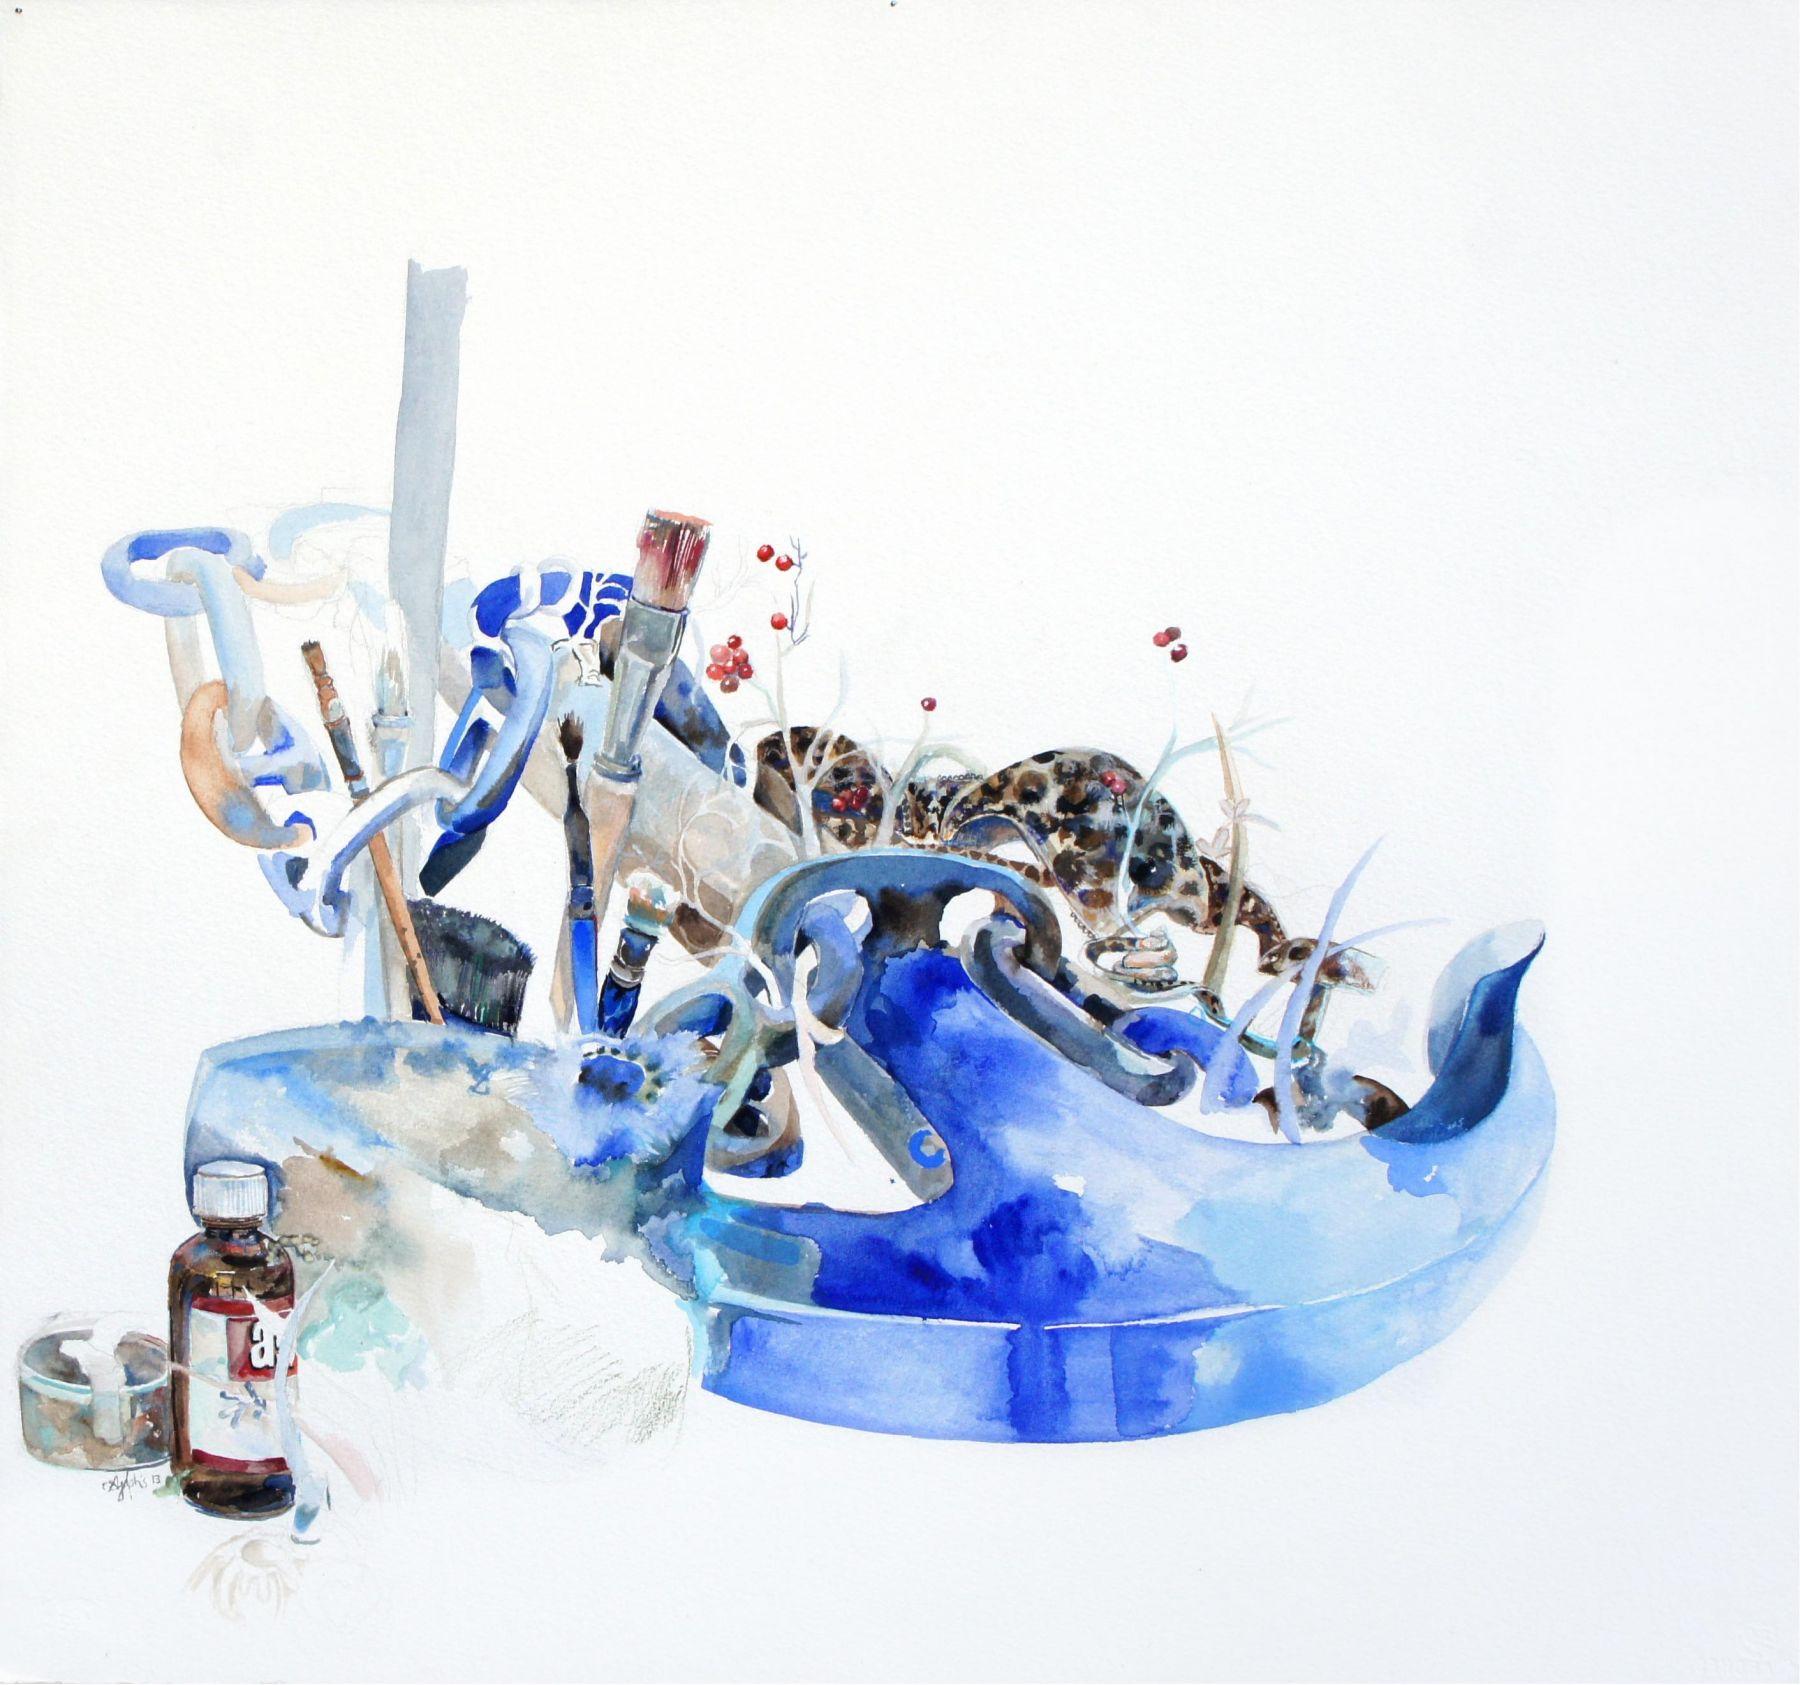 Amanda Humphries, Still Life Study (Perth) 3/5  watercolour and pencil on paper  60 x 60cm  2018